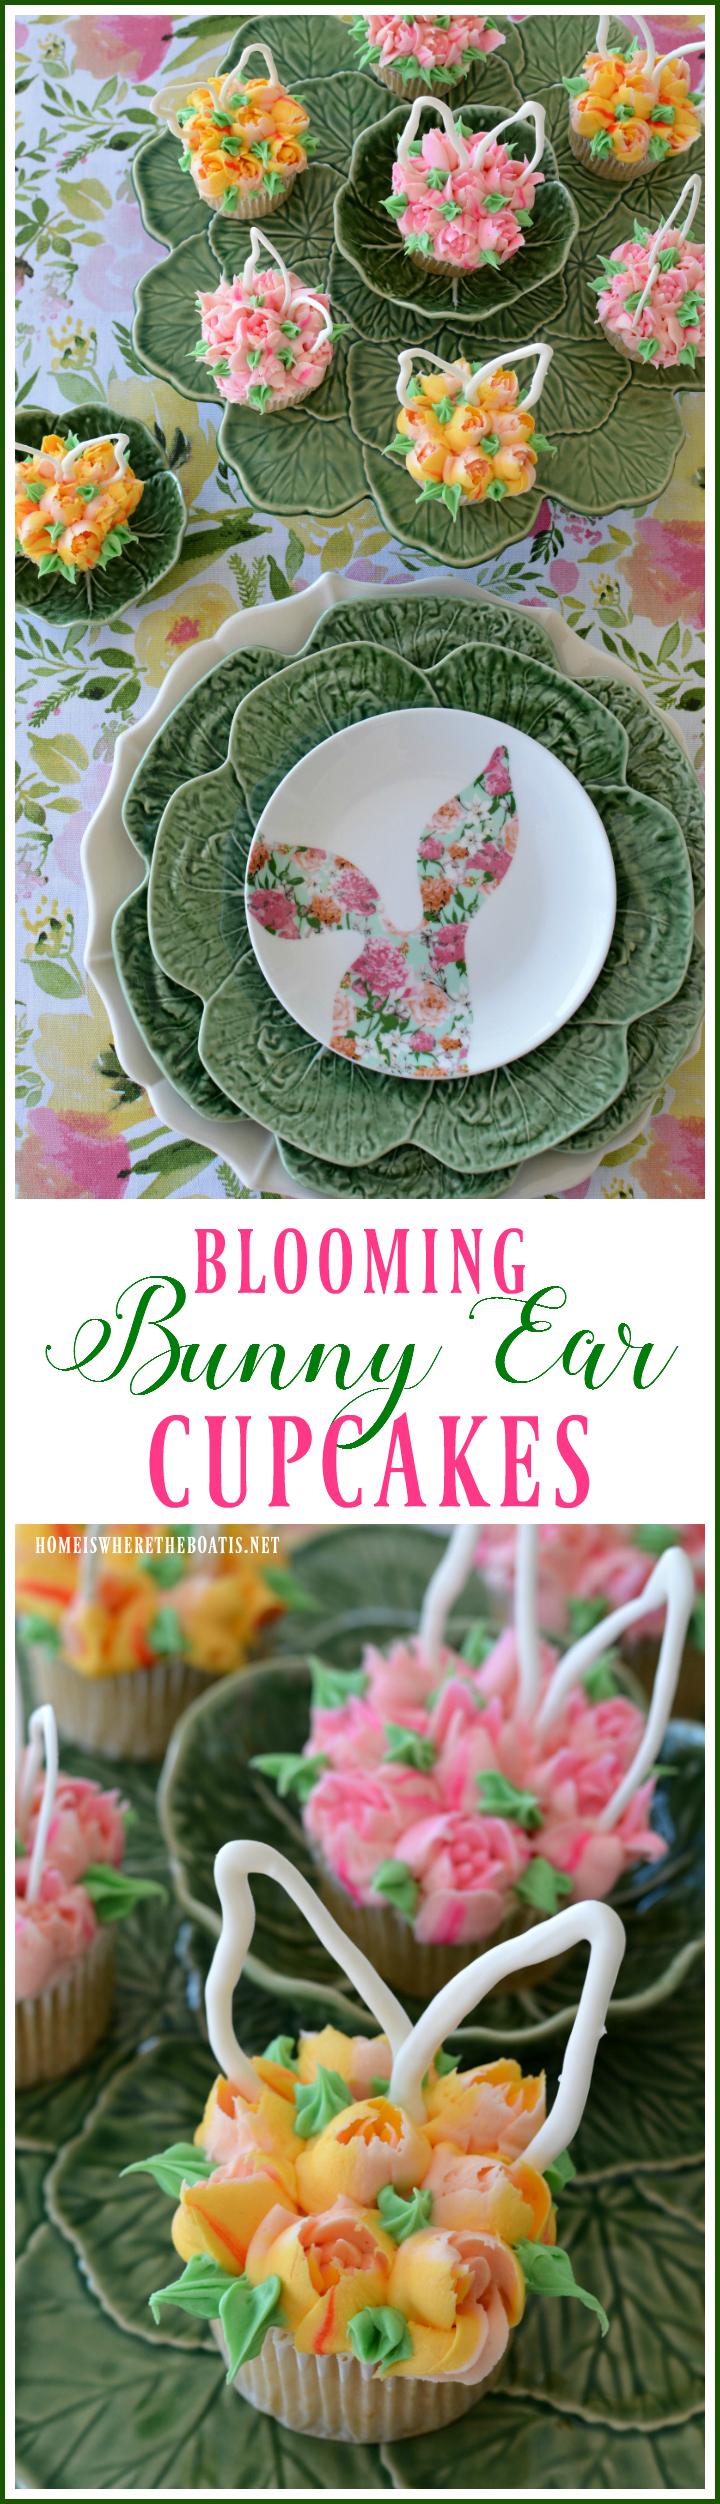 Blooming Bunny Ear Cupcakes | ©homeiswheretheboatis.net #Easter #cupcakes #bunnies